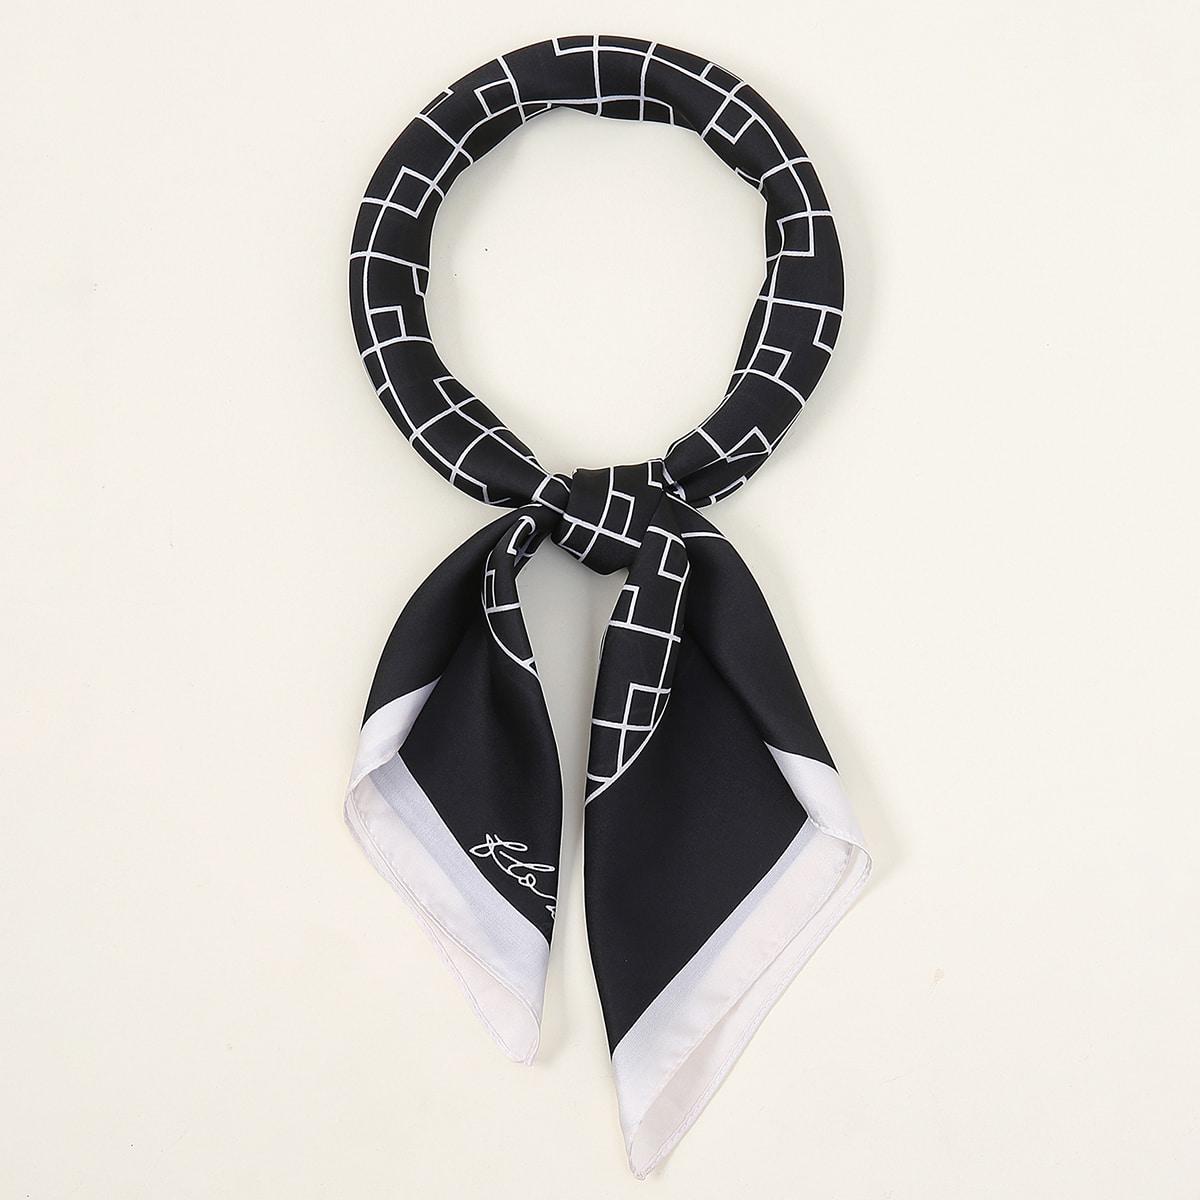 shein Bandana met geometrisch patroon